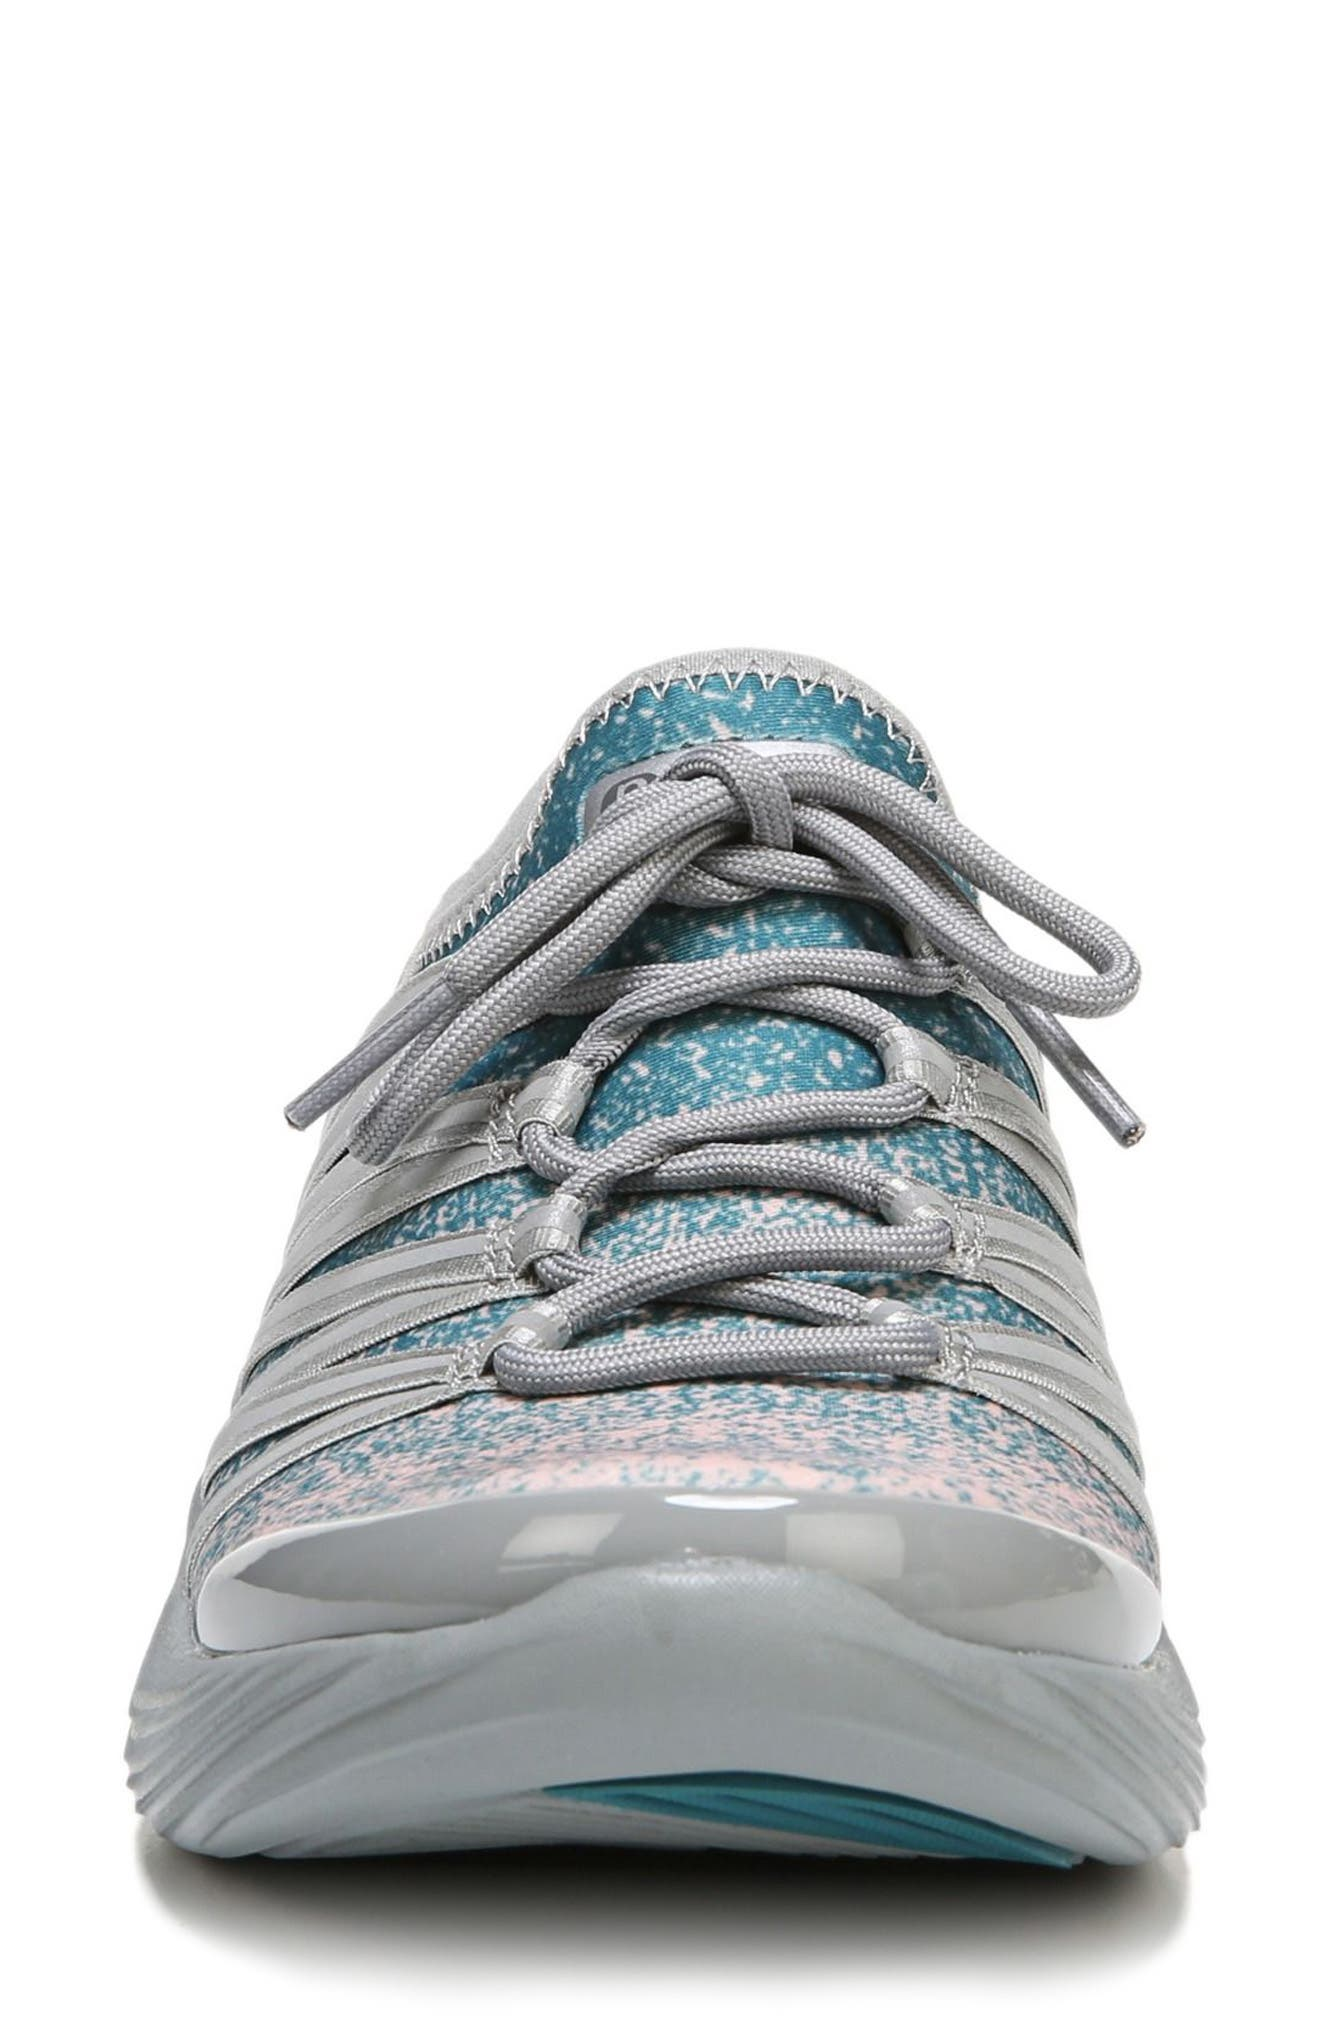 Tender Sneaker,                             Alternate thumbnail 4, color,                             Pink Fabric